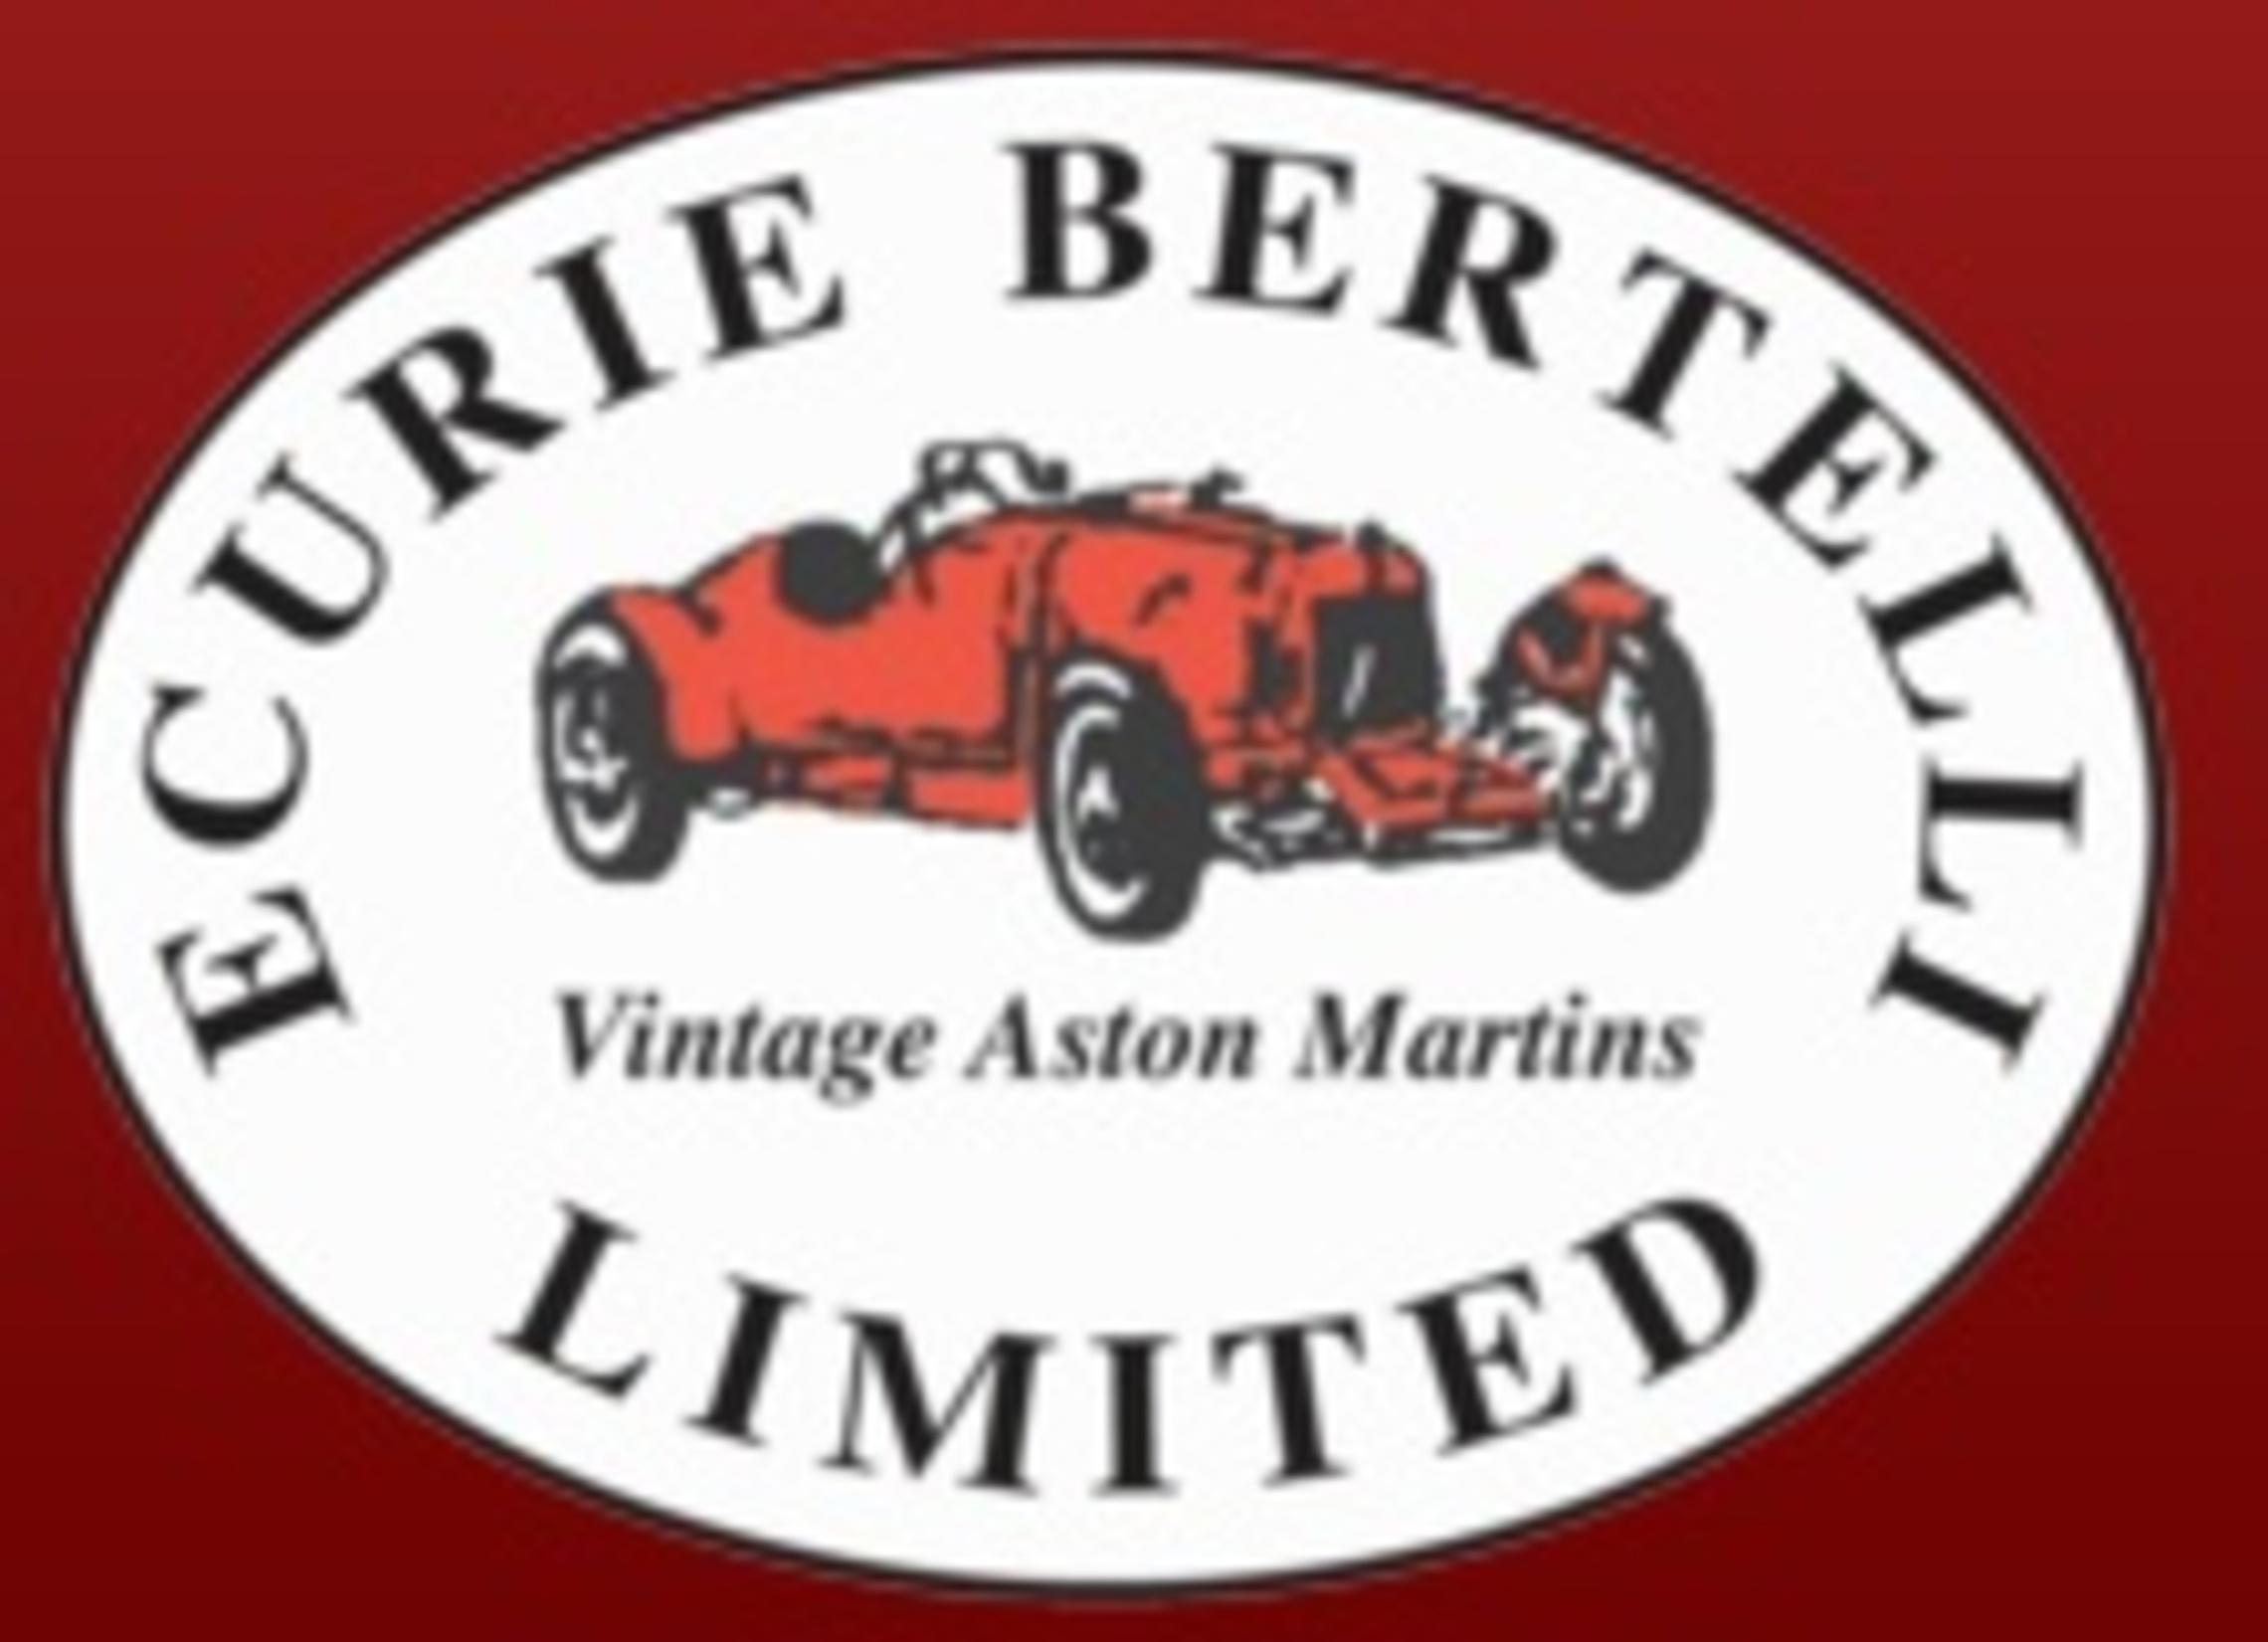 ecurie bertelli- company logo